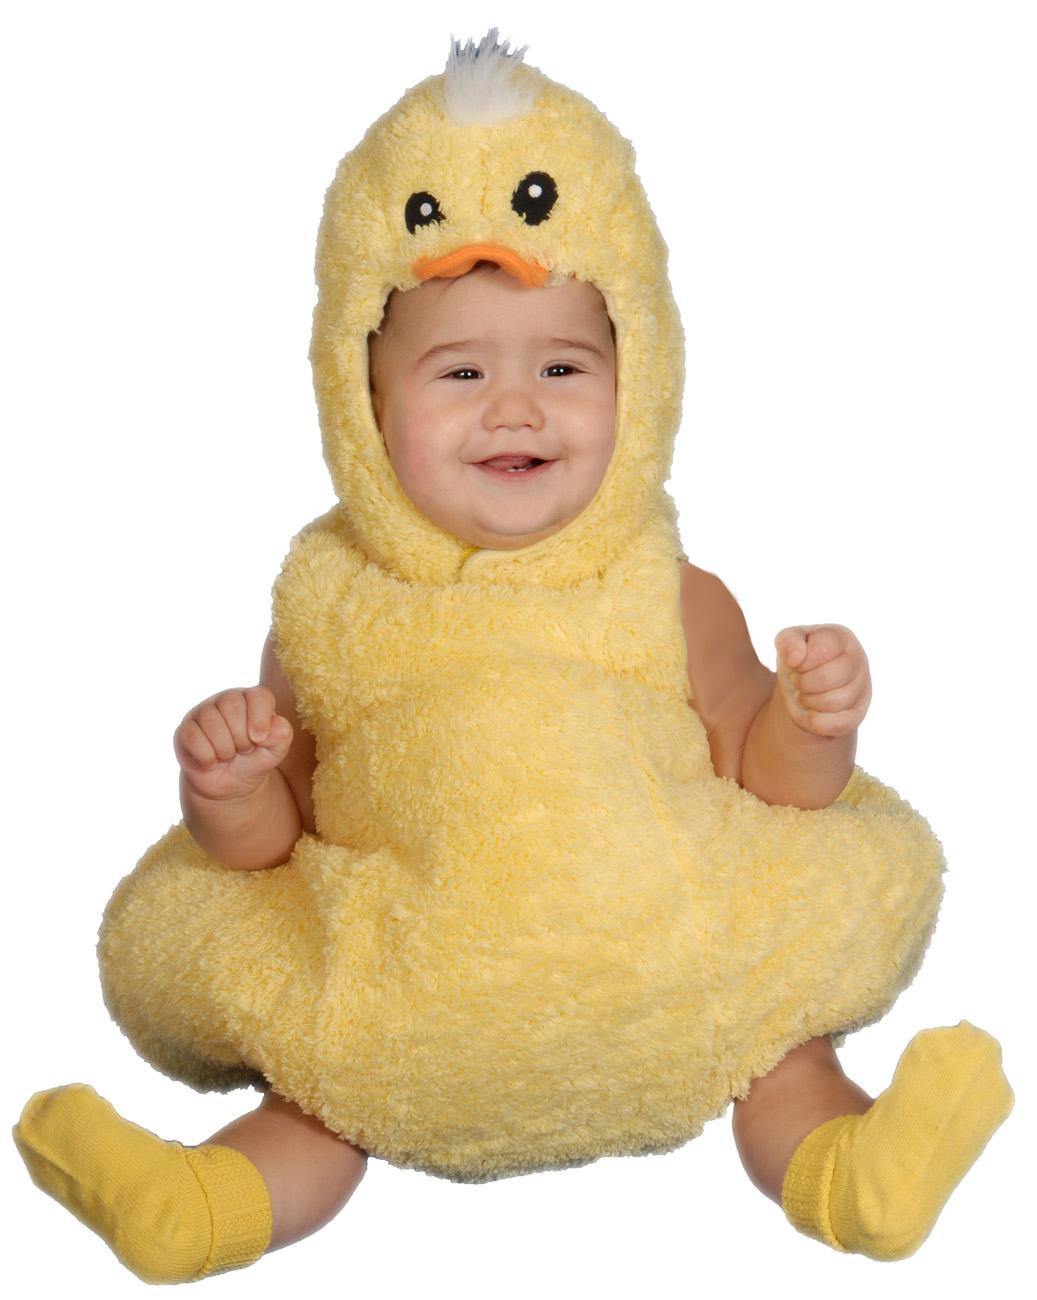 Disfraces de bebes de un a o mundo beb - Disfraces para bebes de un ano ...